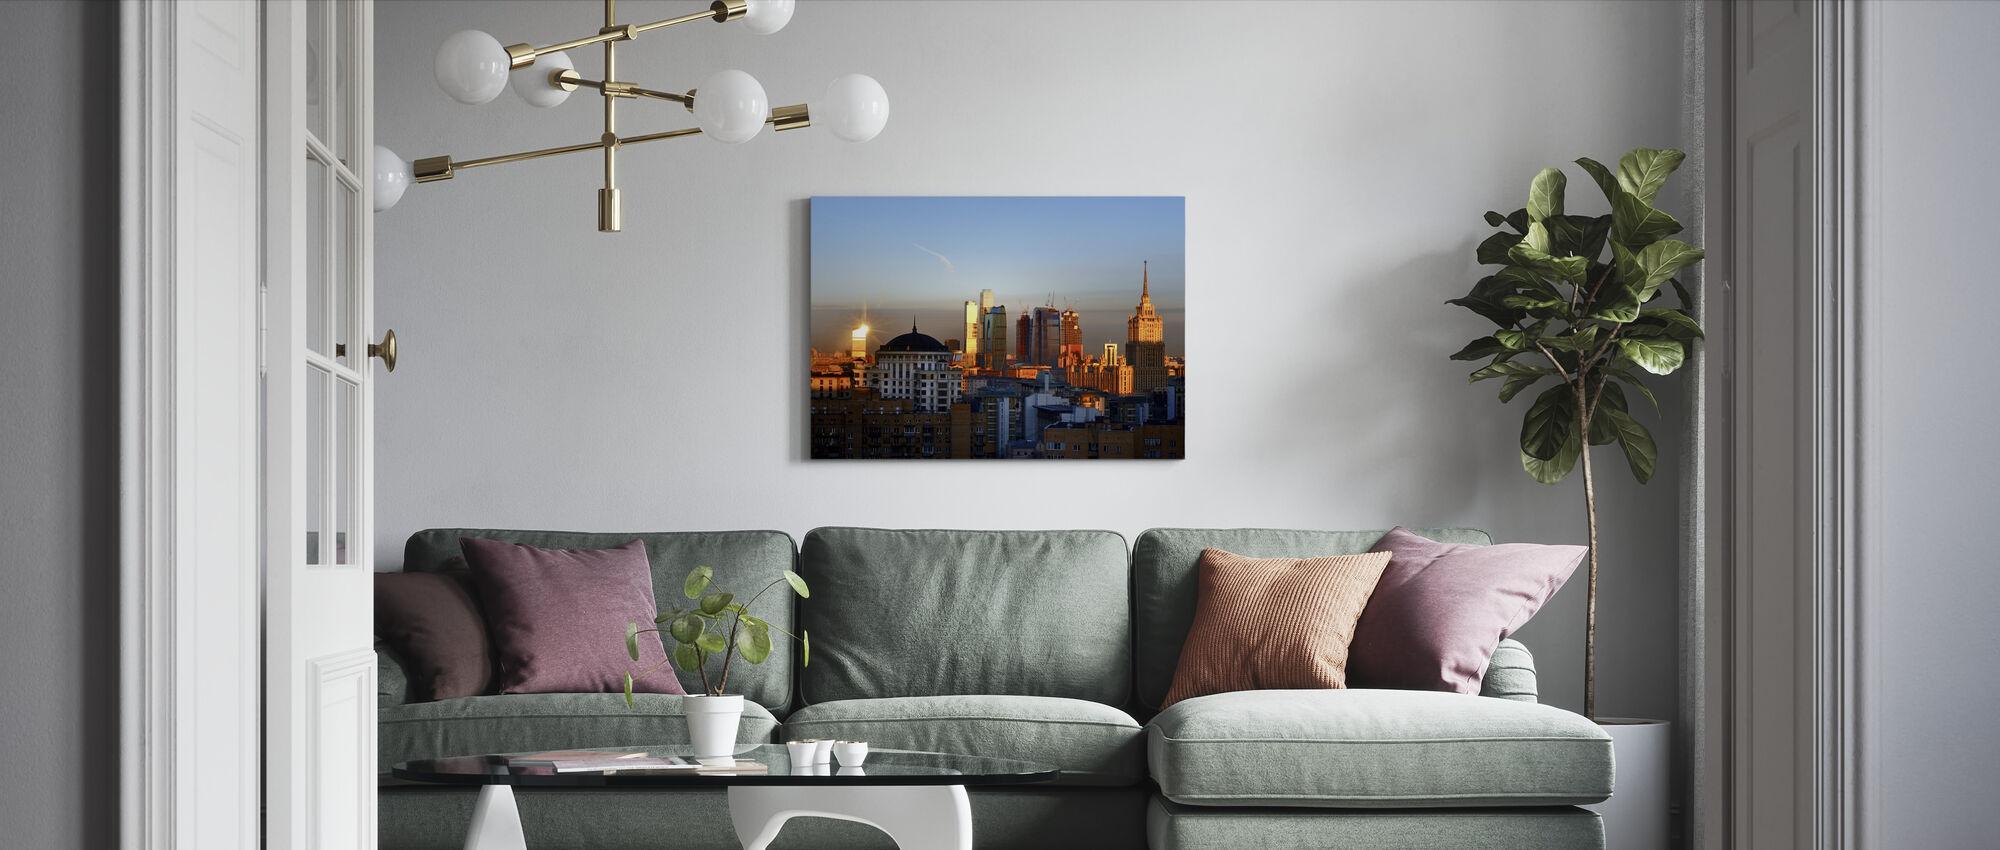 Moskovan Skyline auringonnousussa - Canvastaulu - Olohuone